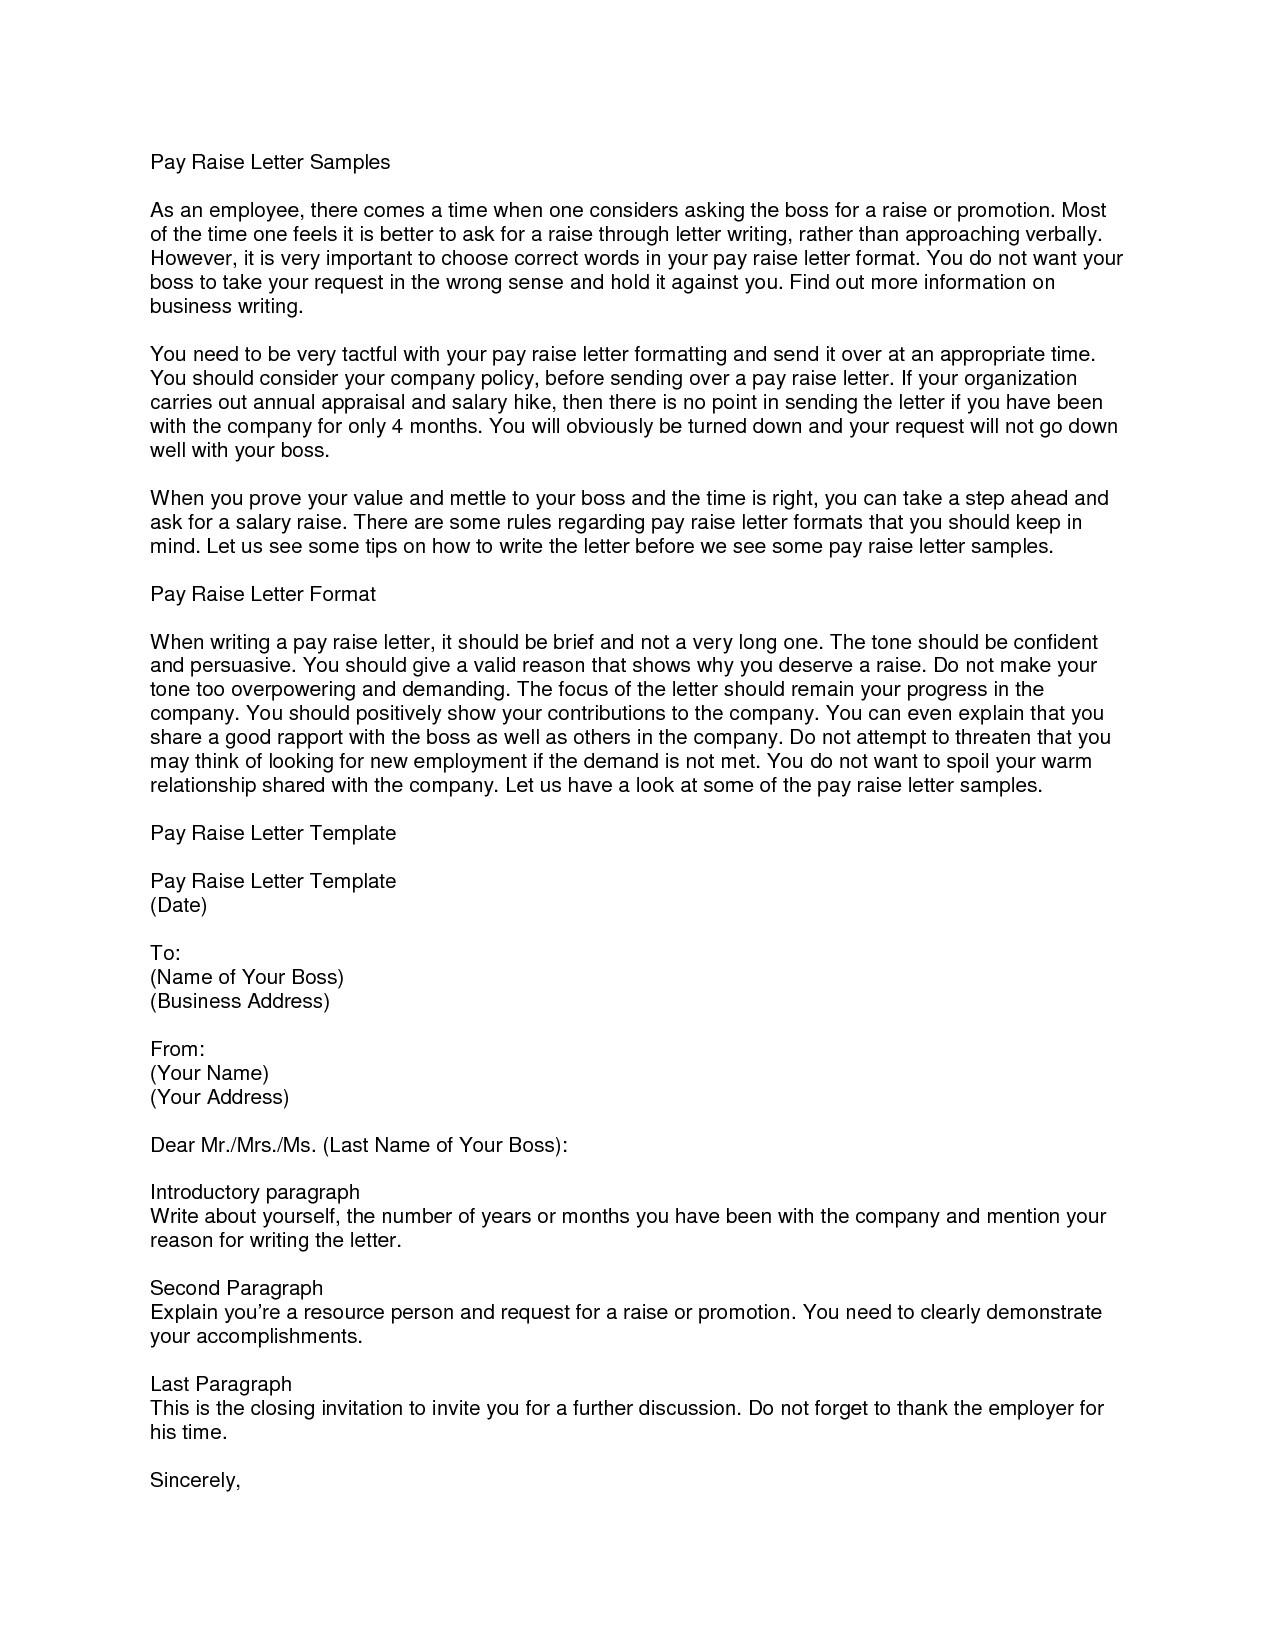 Mortgage Pre Approval Letter Template - Fresh Best Gift Letter Sample Template